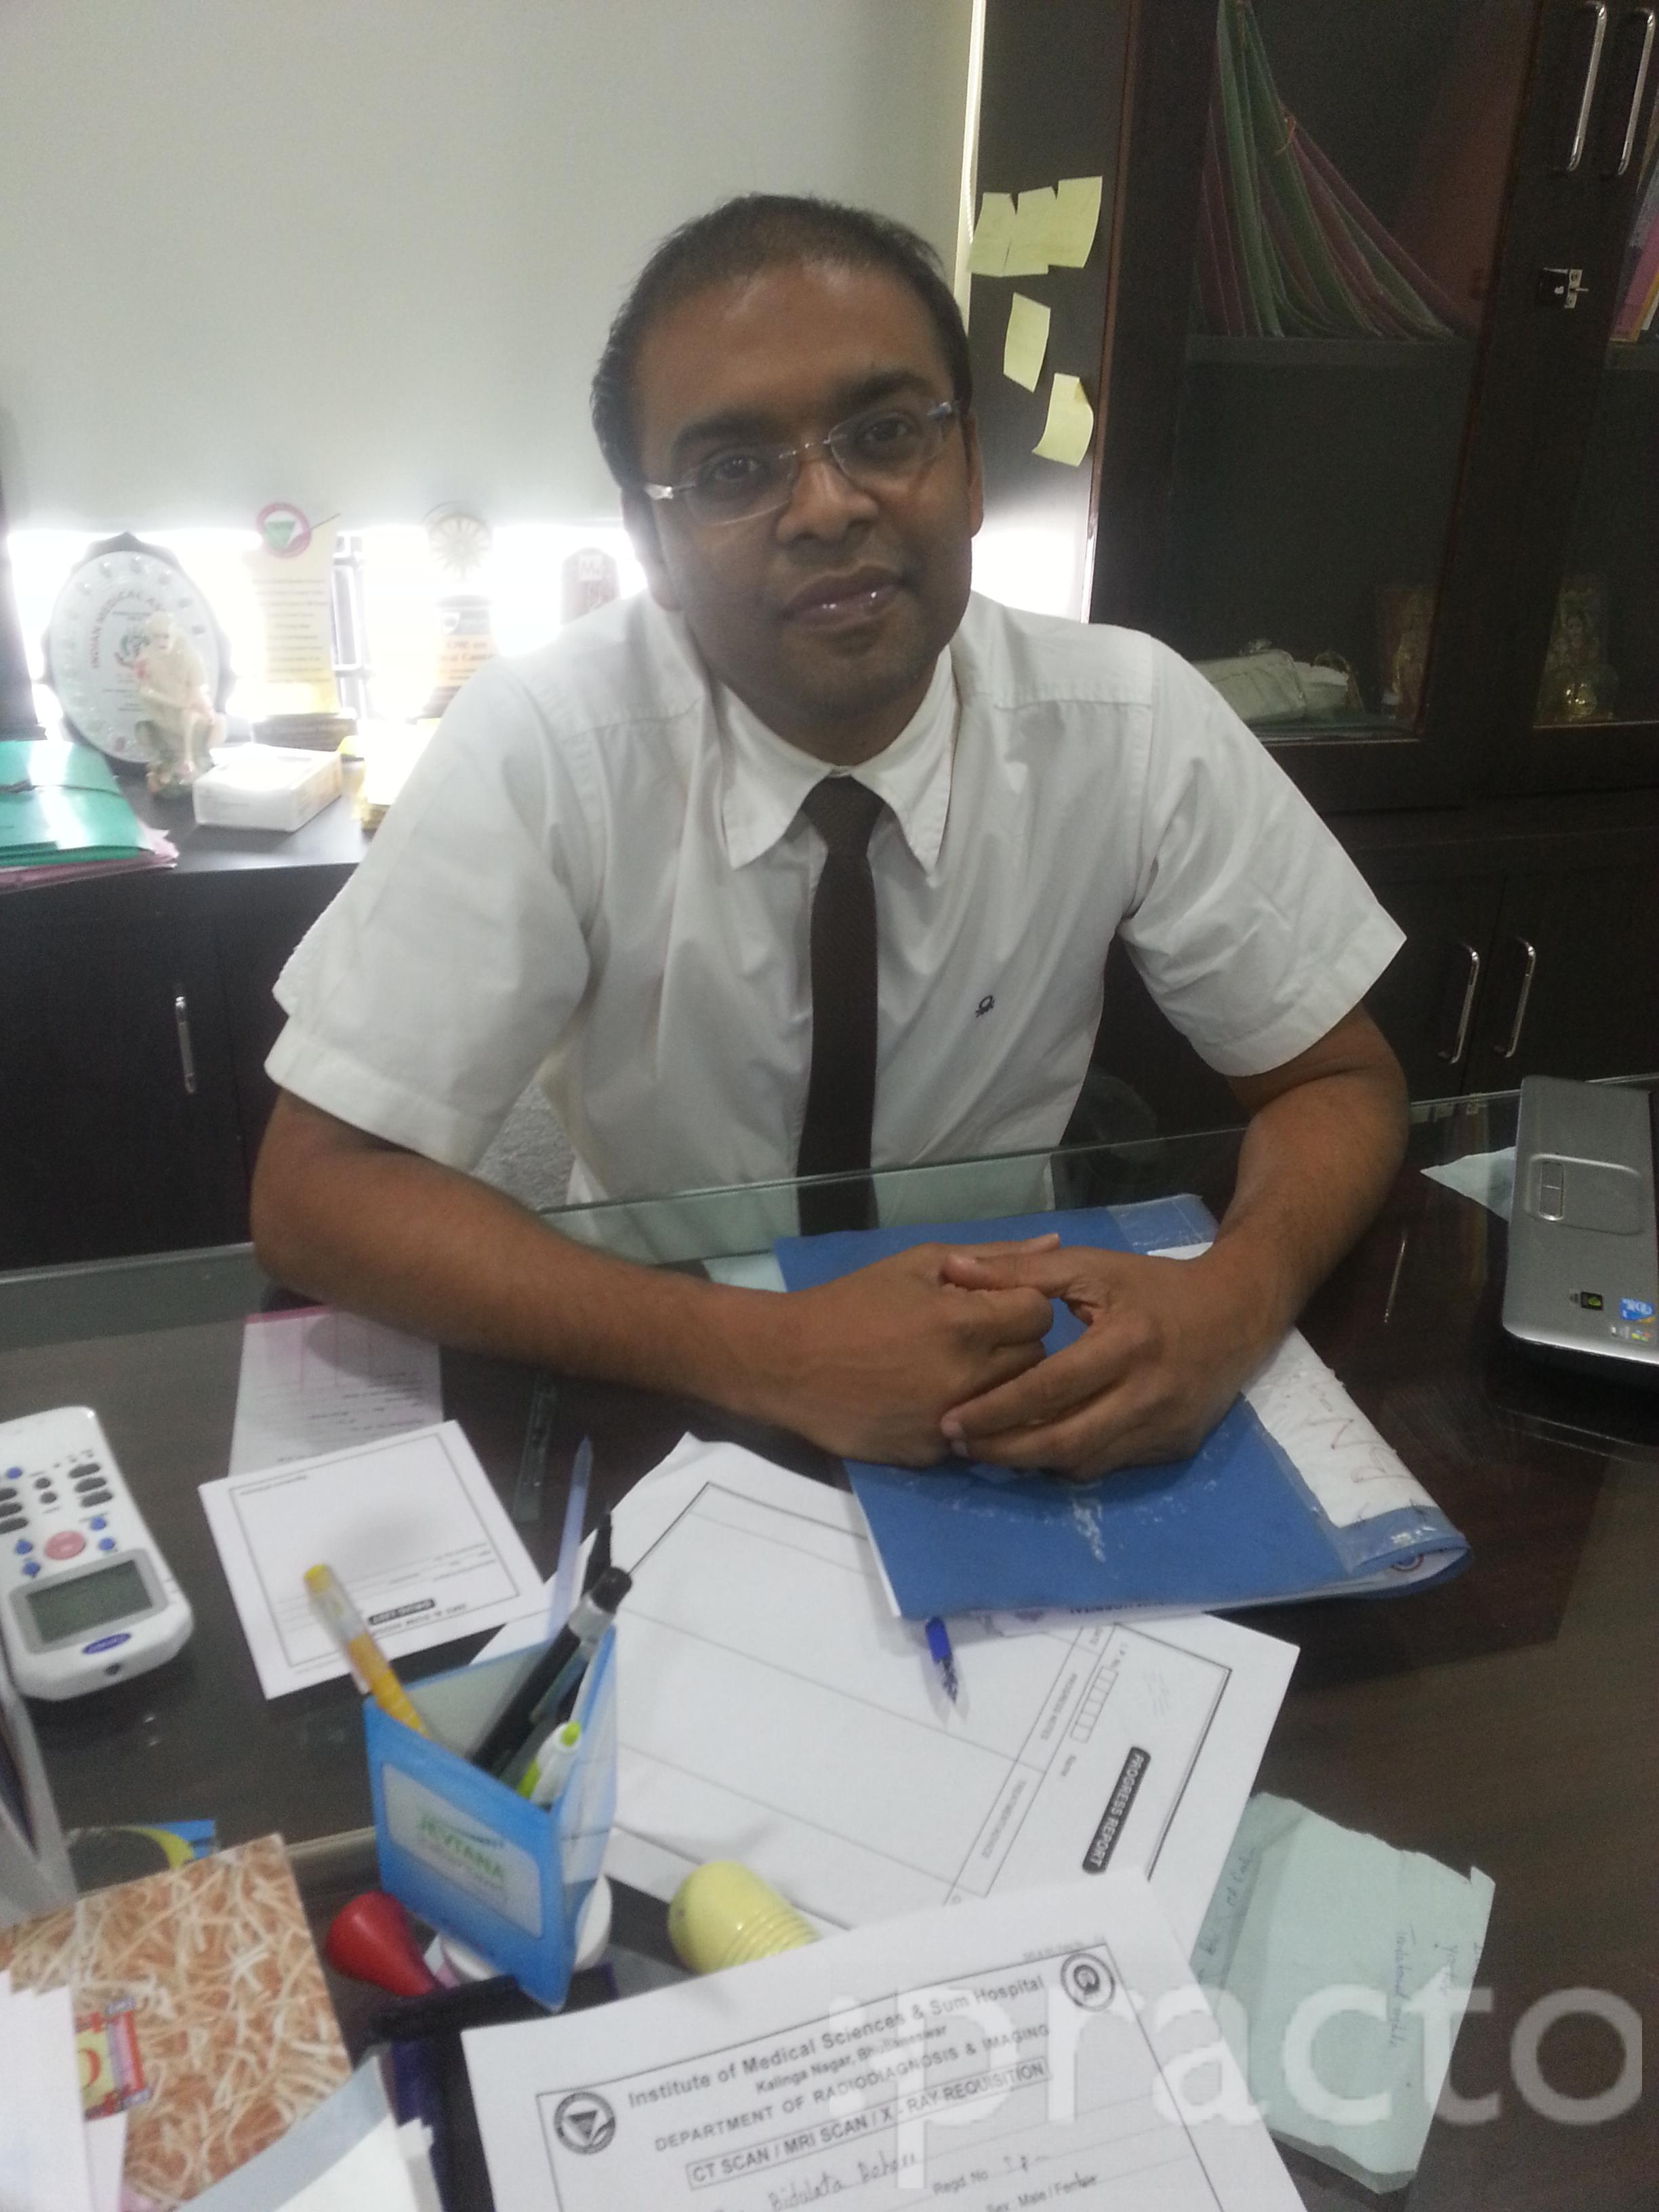 Agrawala ims and sum hospital bhubaneswar r s, reviews, user reviews